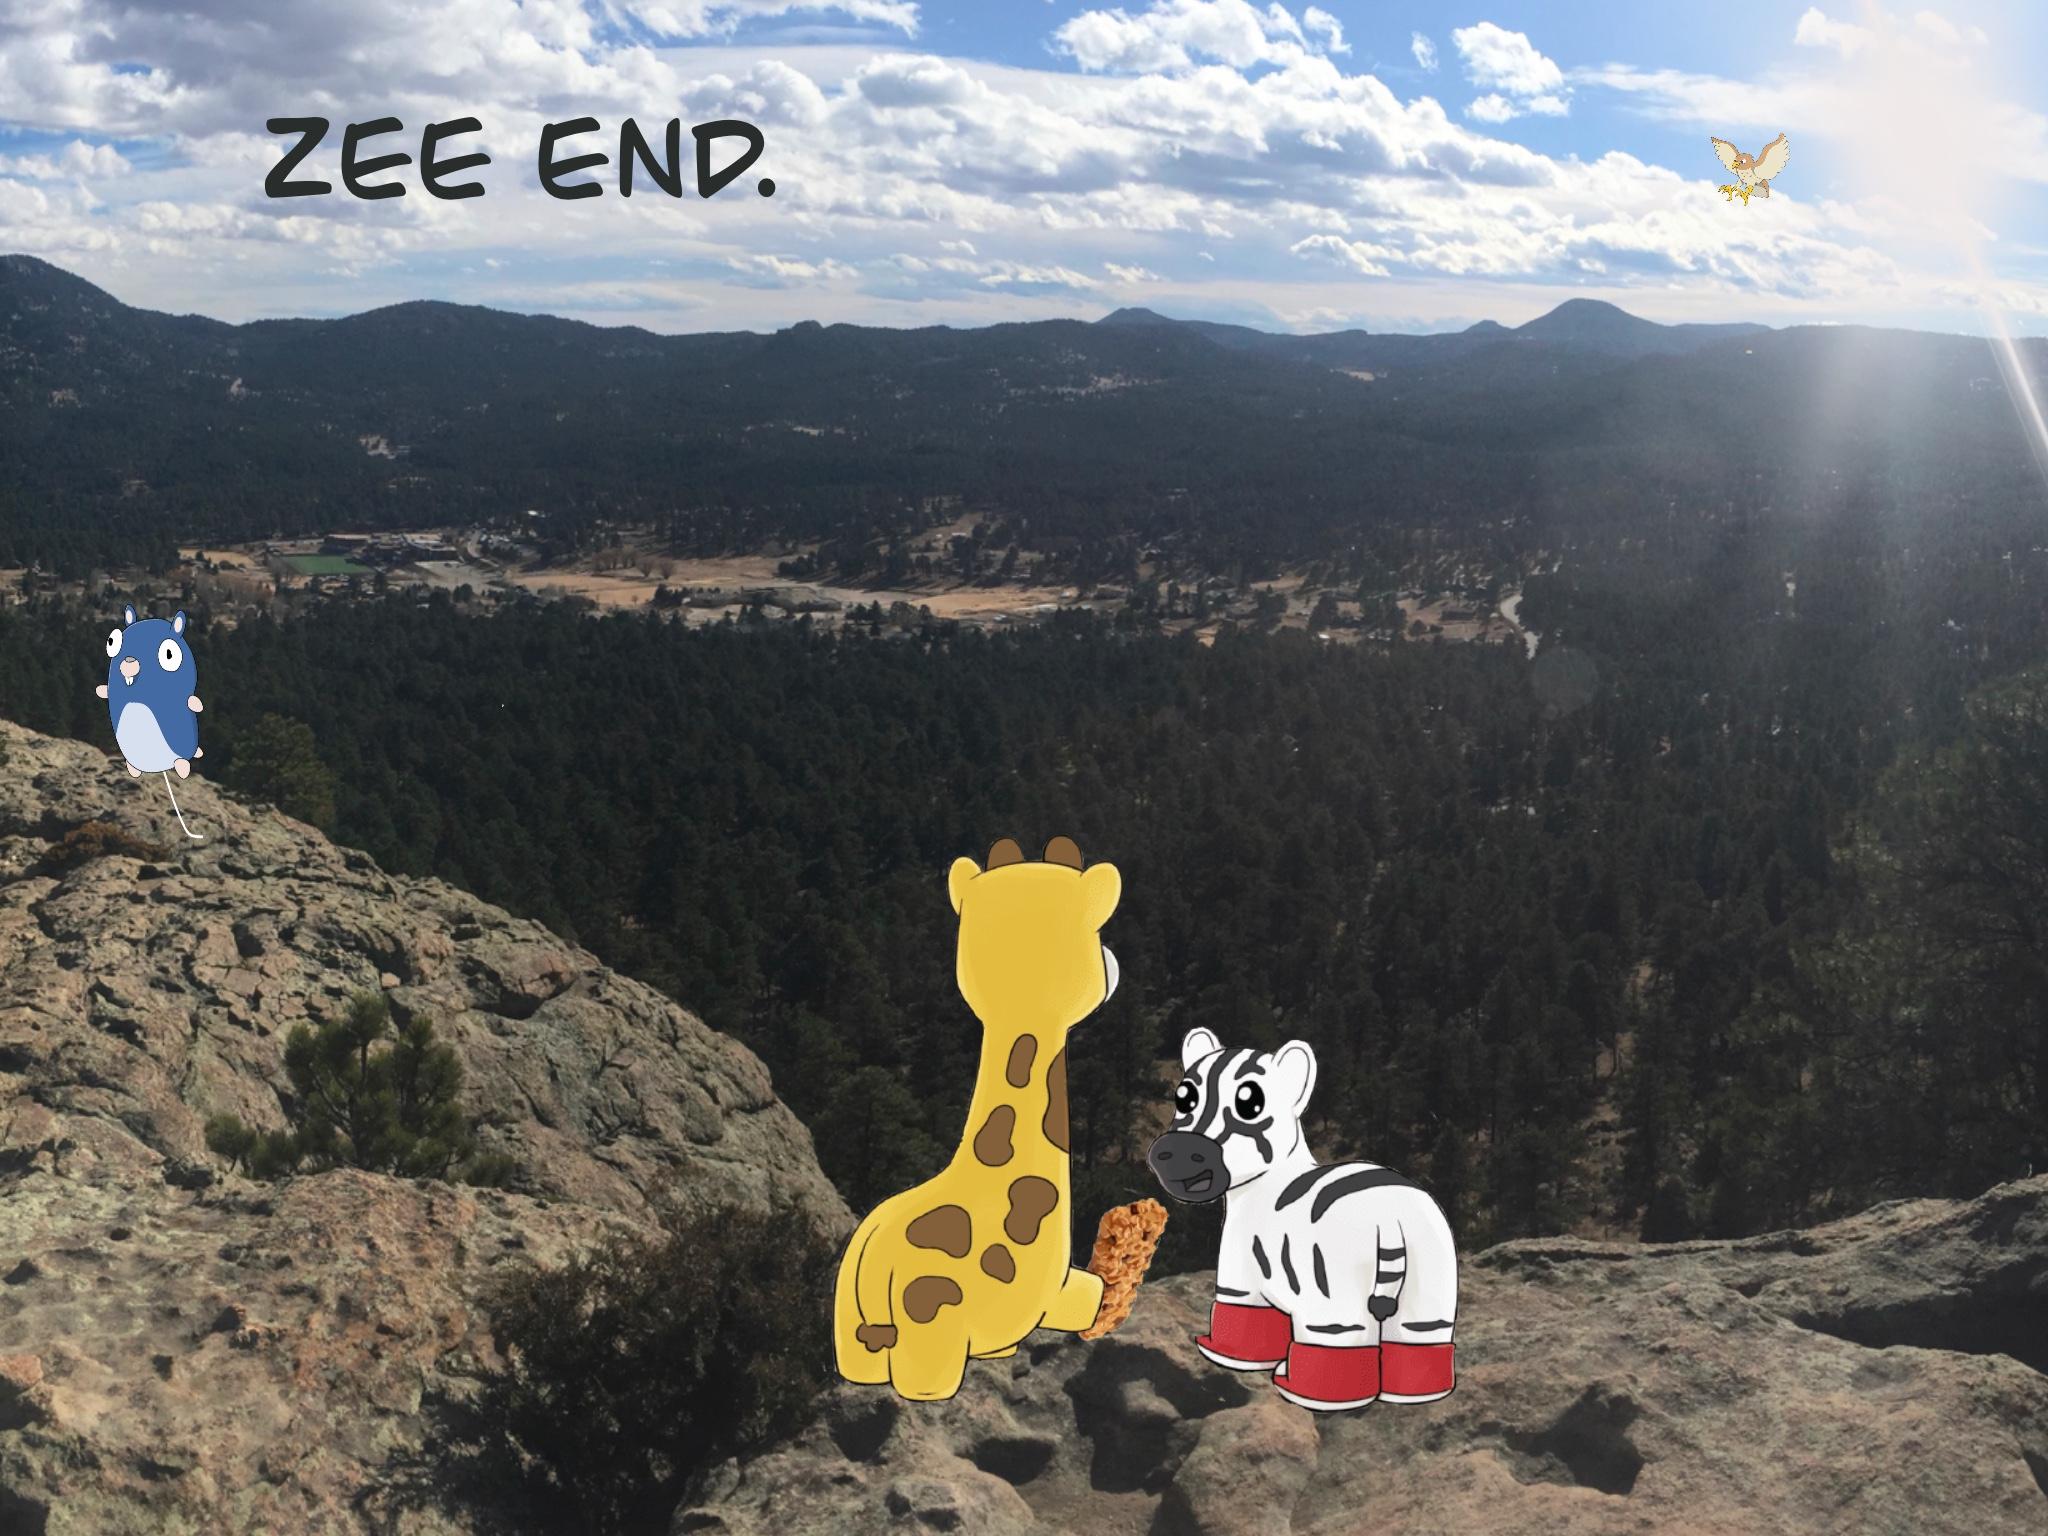 zee-end-new